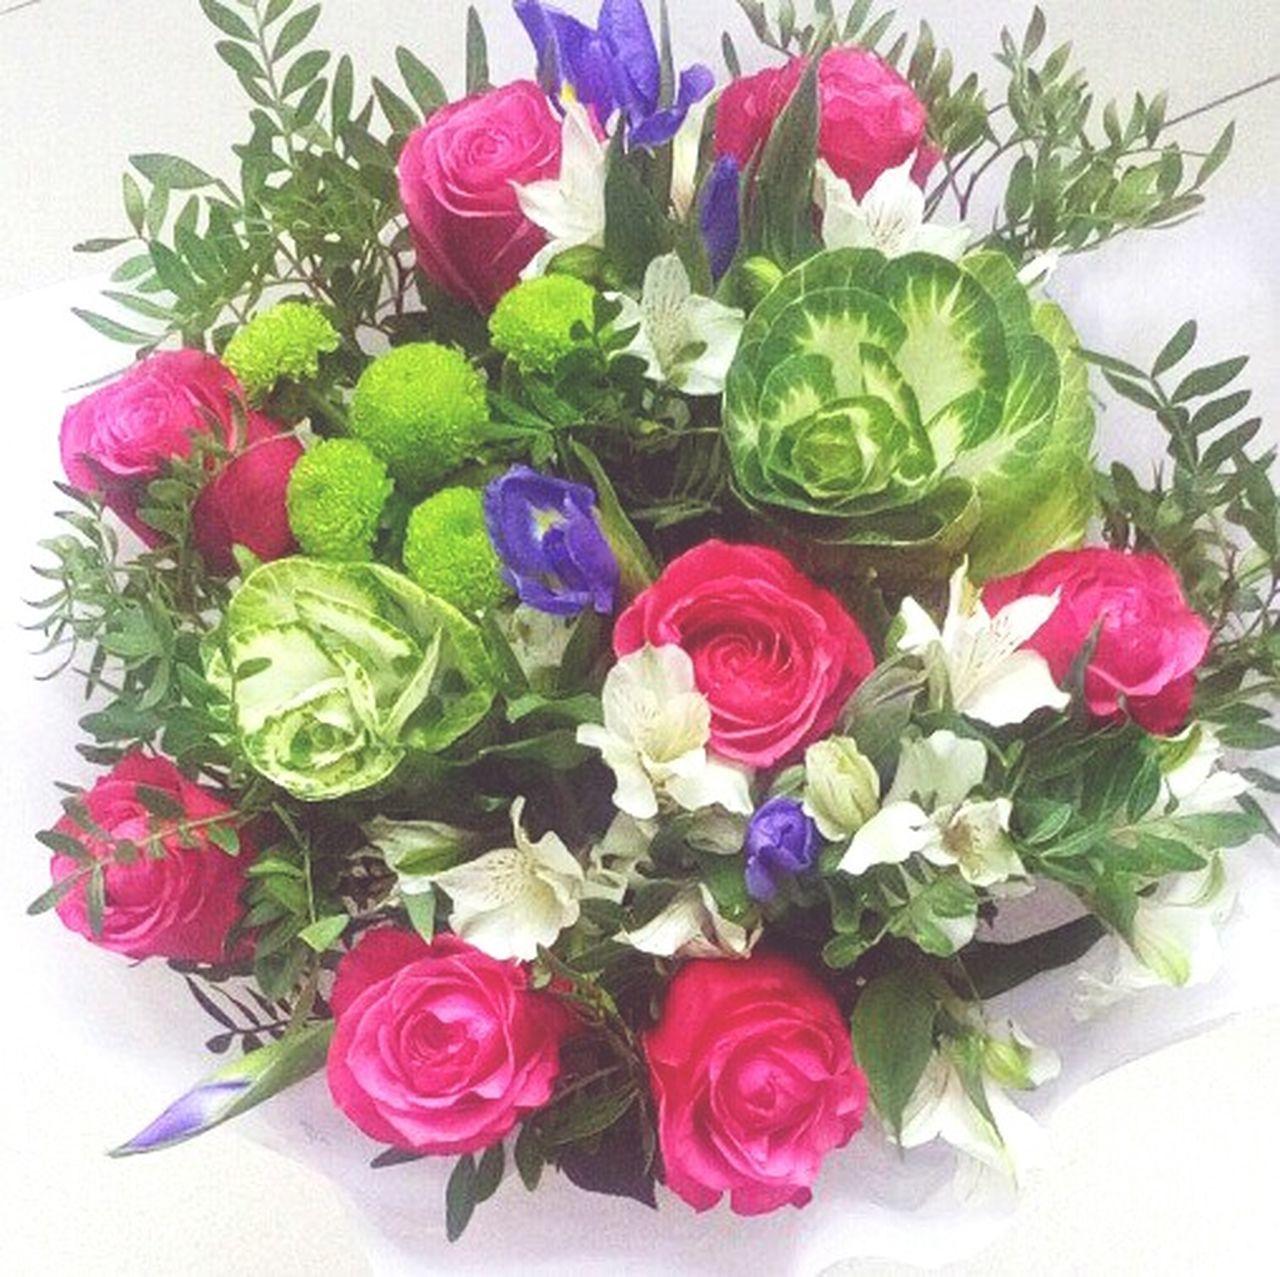 Flower Multi Colored розы капустка No People цветы букет мояработа